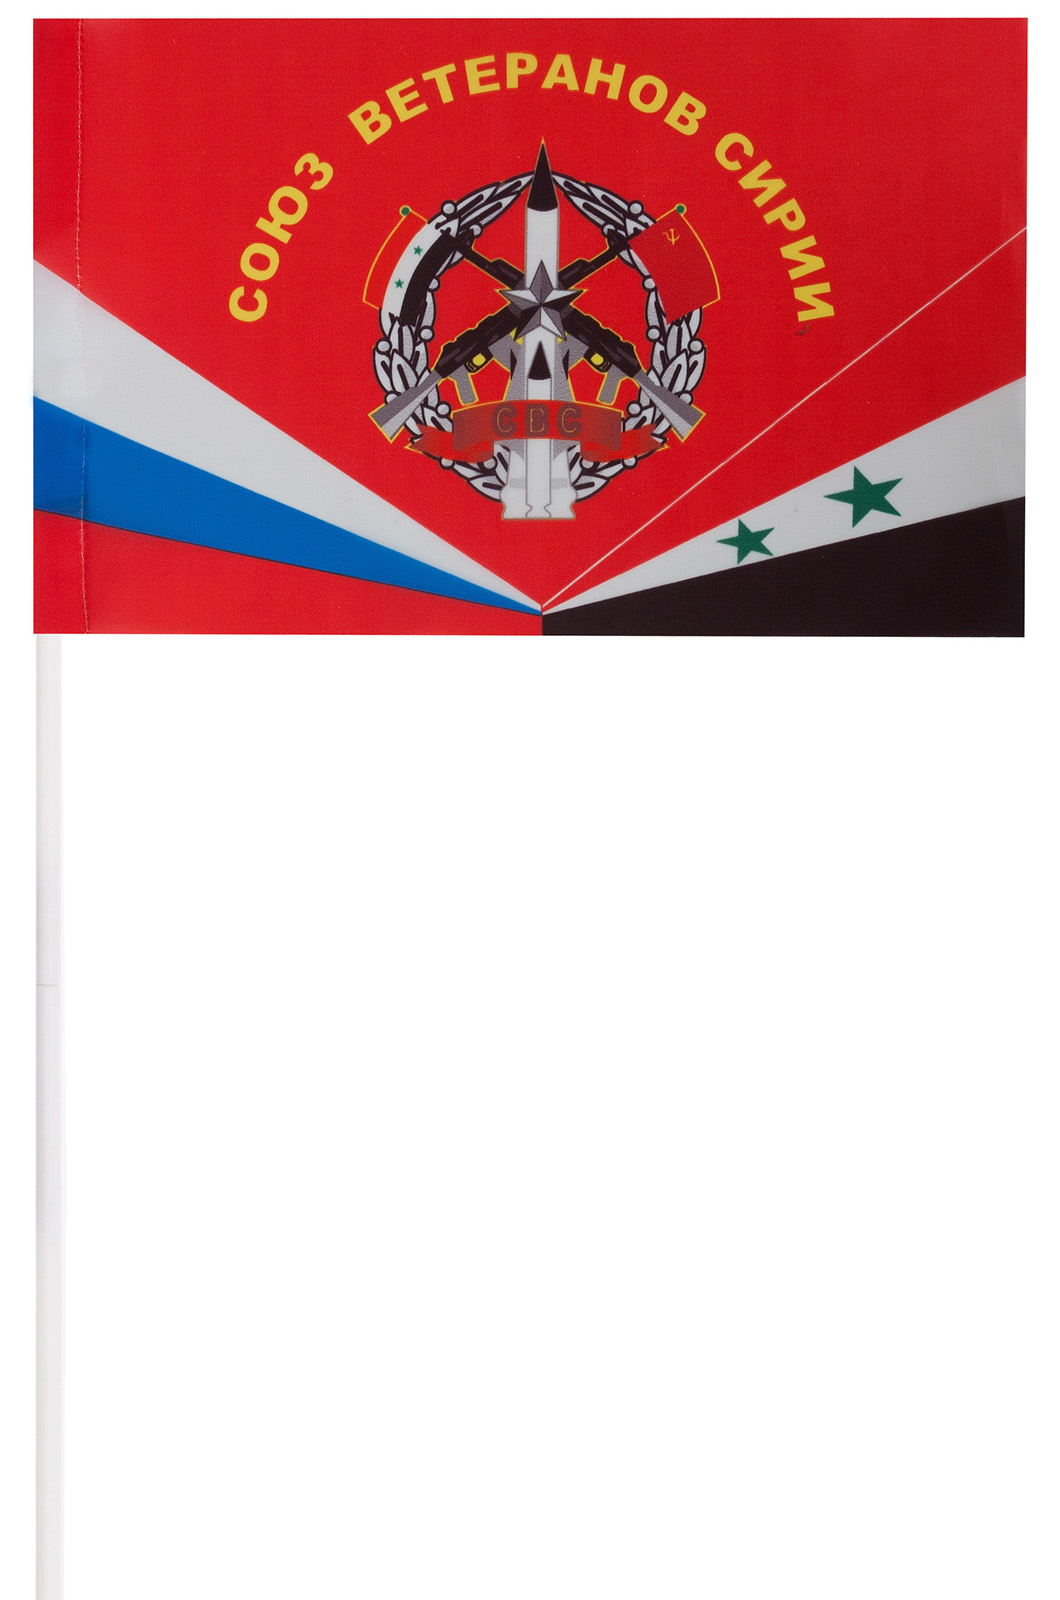 Флажок Союза ветеранов Сирии